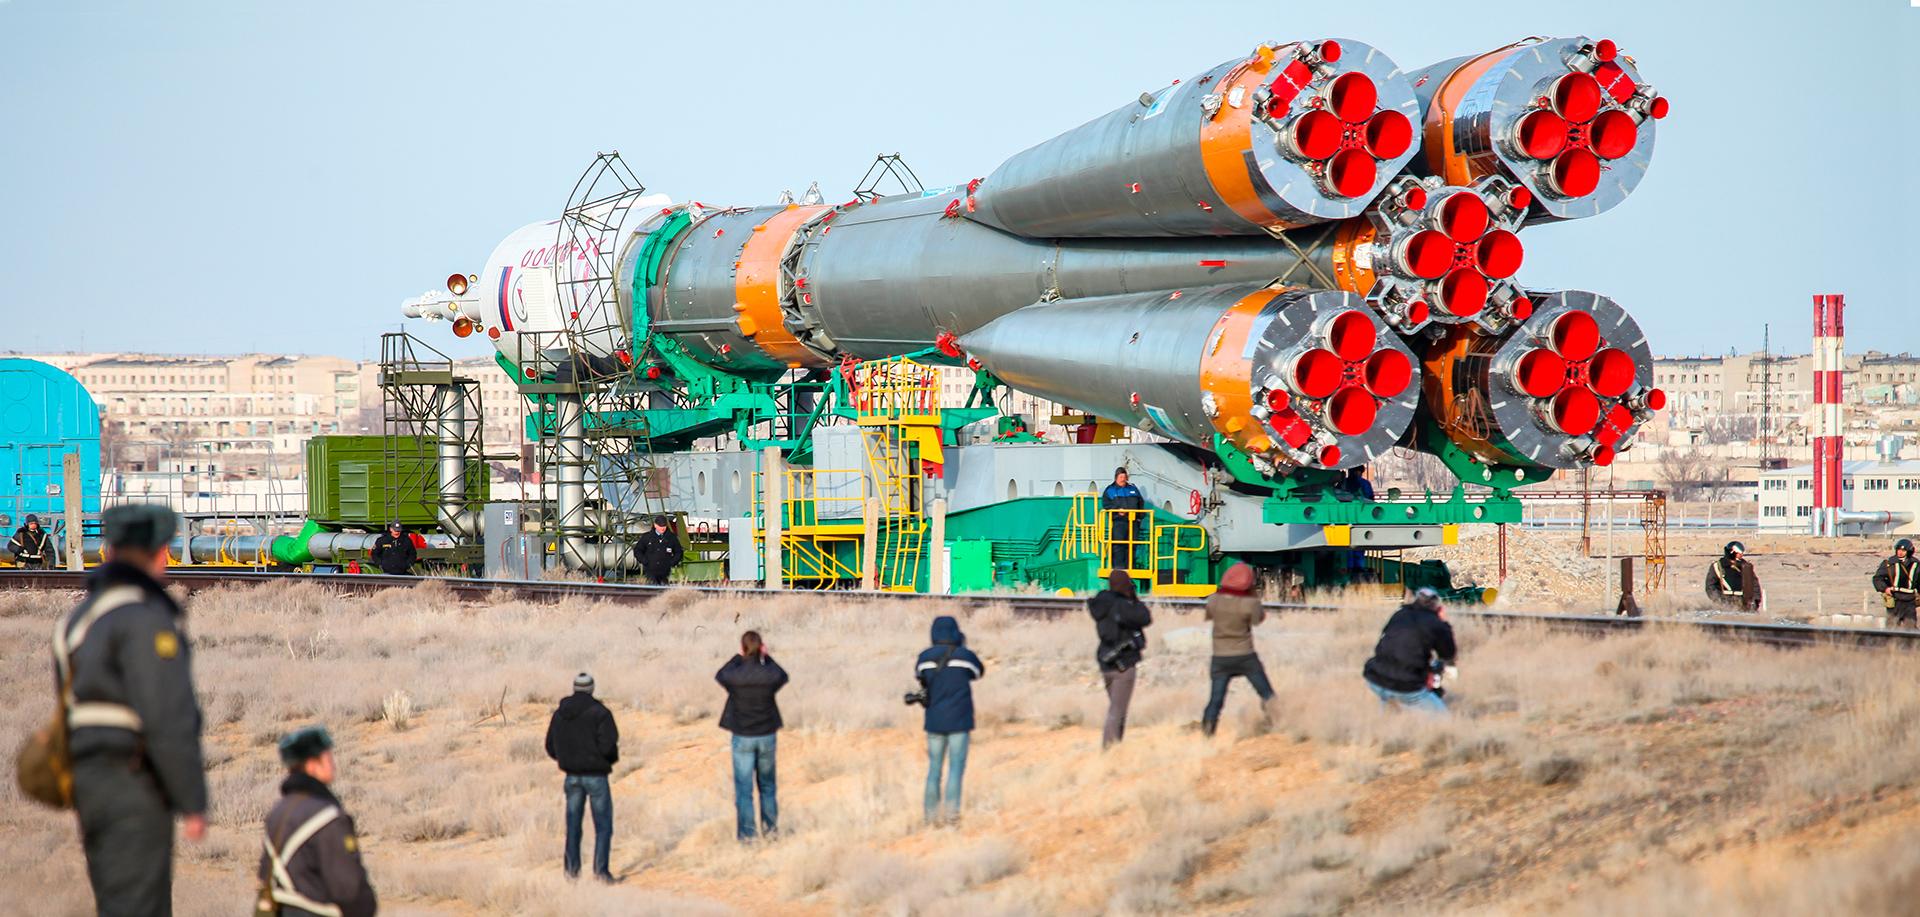 Soiuz rocket launching, Baikonur 2010, Kazakhstan, ракета, Союз, railways, Gagarin start, press, journalists